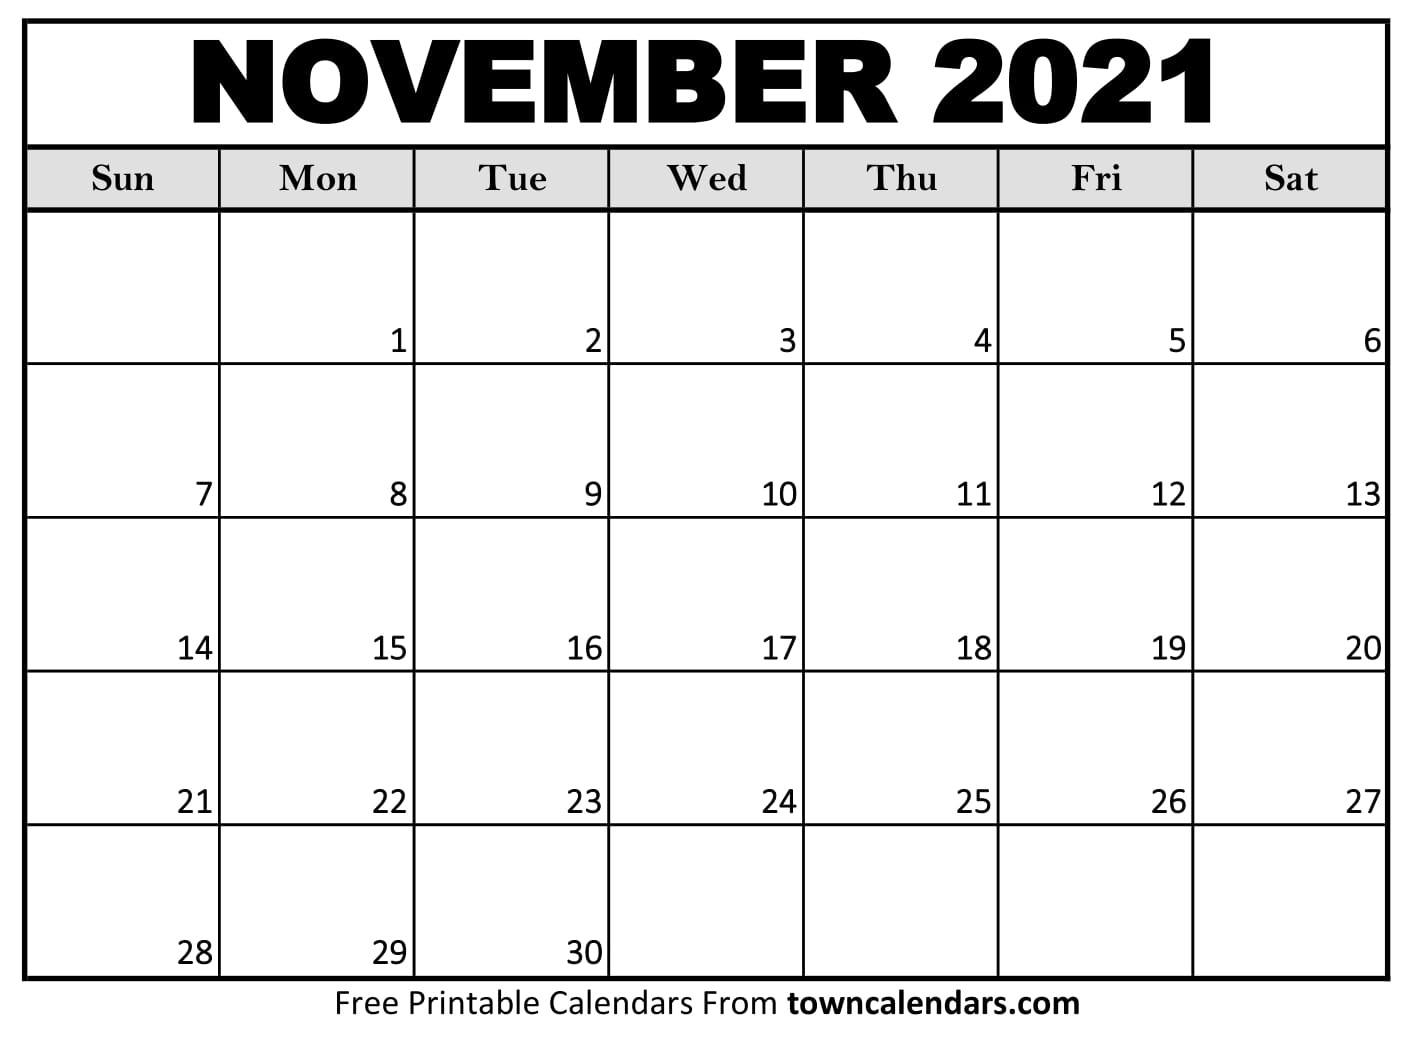 Printable November 2021 Calendar - Towncalendars November 2021 Calendar To Print